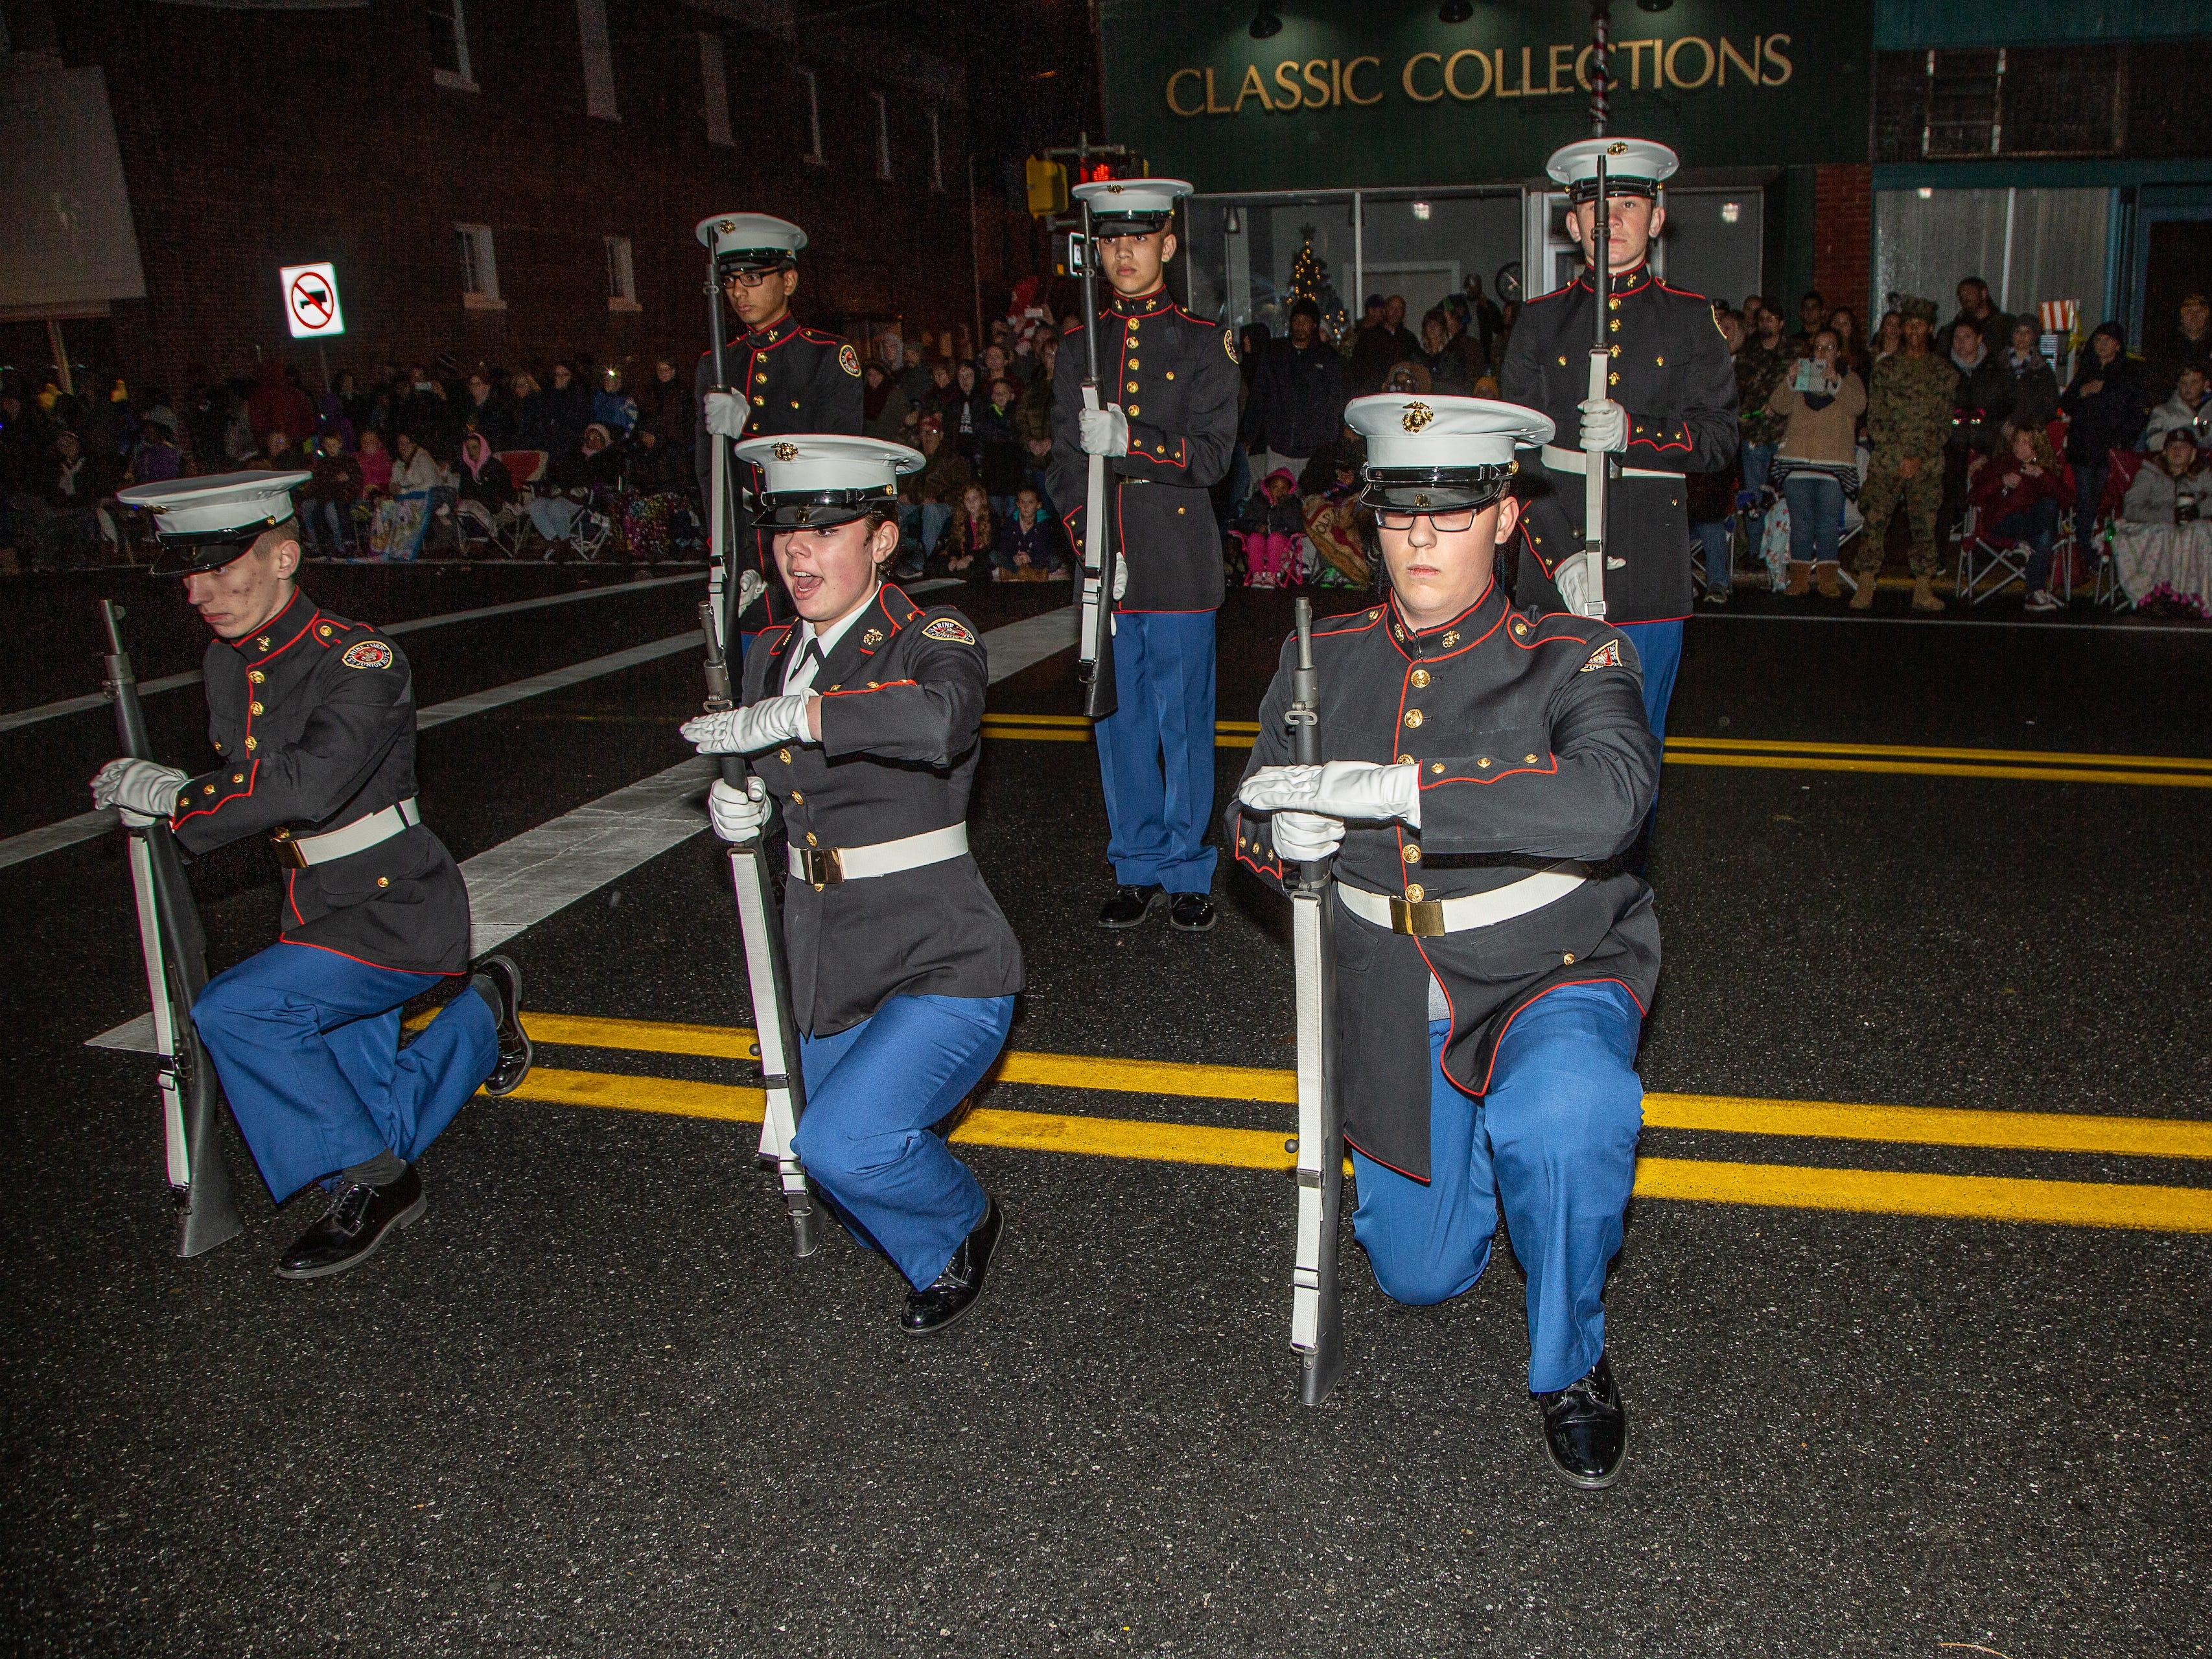 Pocomoke High School ROTC unit performs during the Christmas parade on Nov. 26.